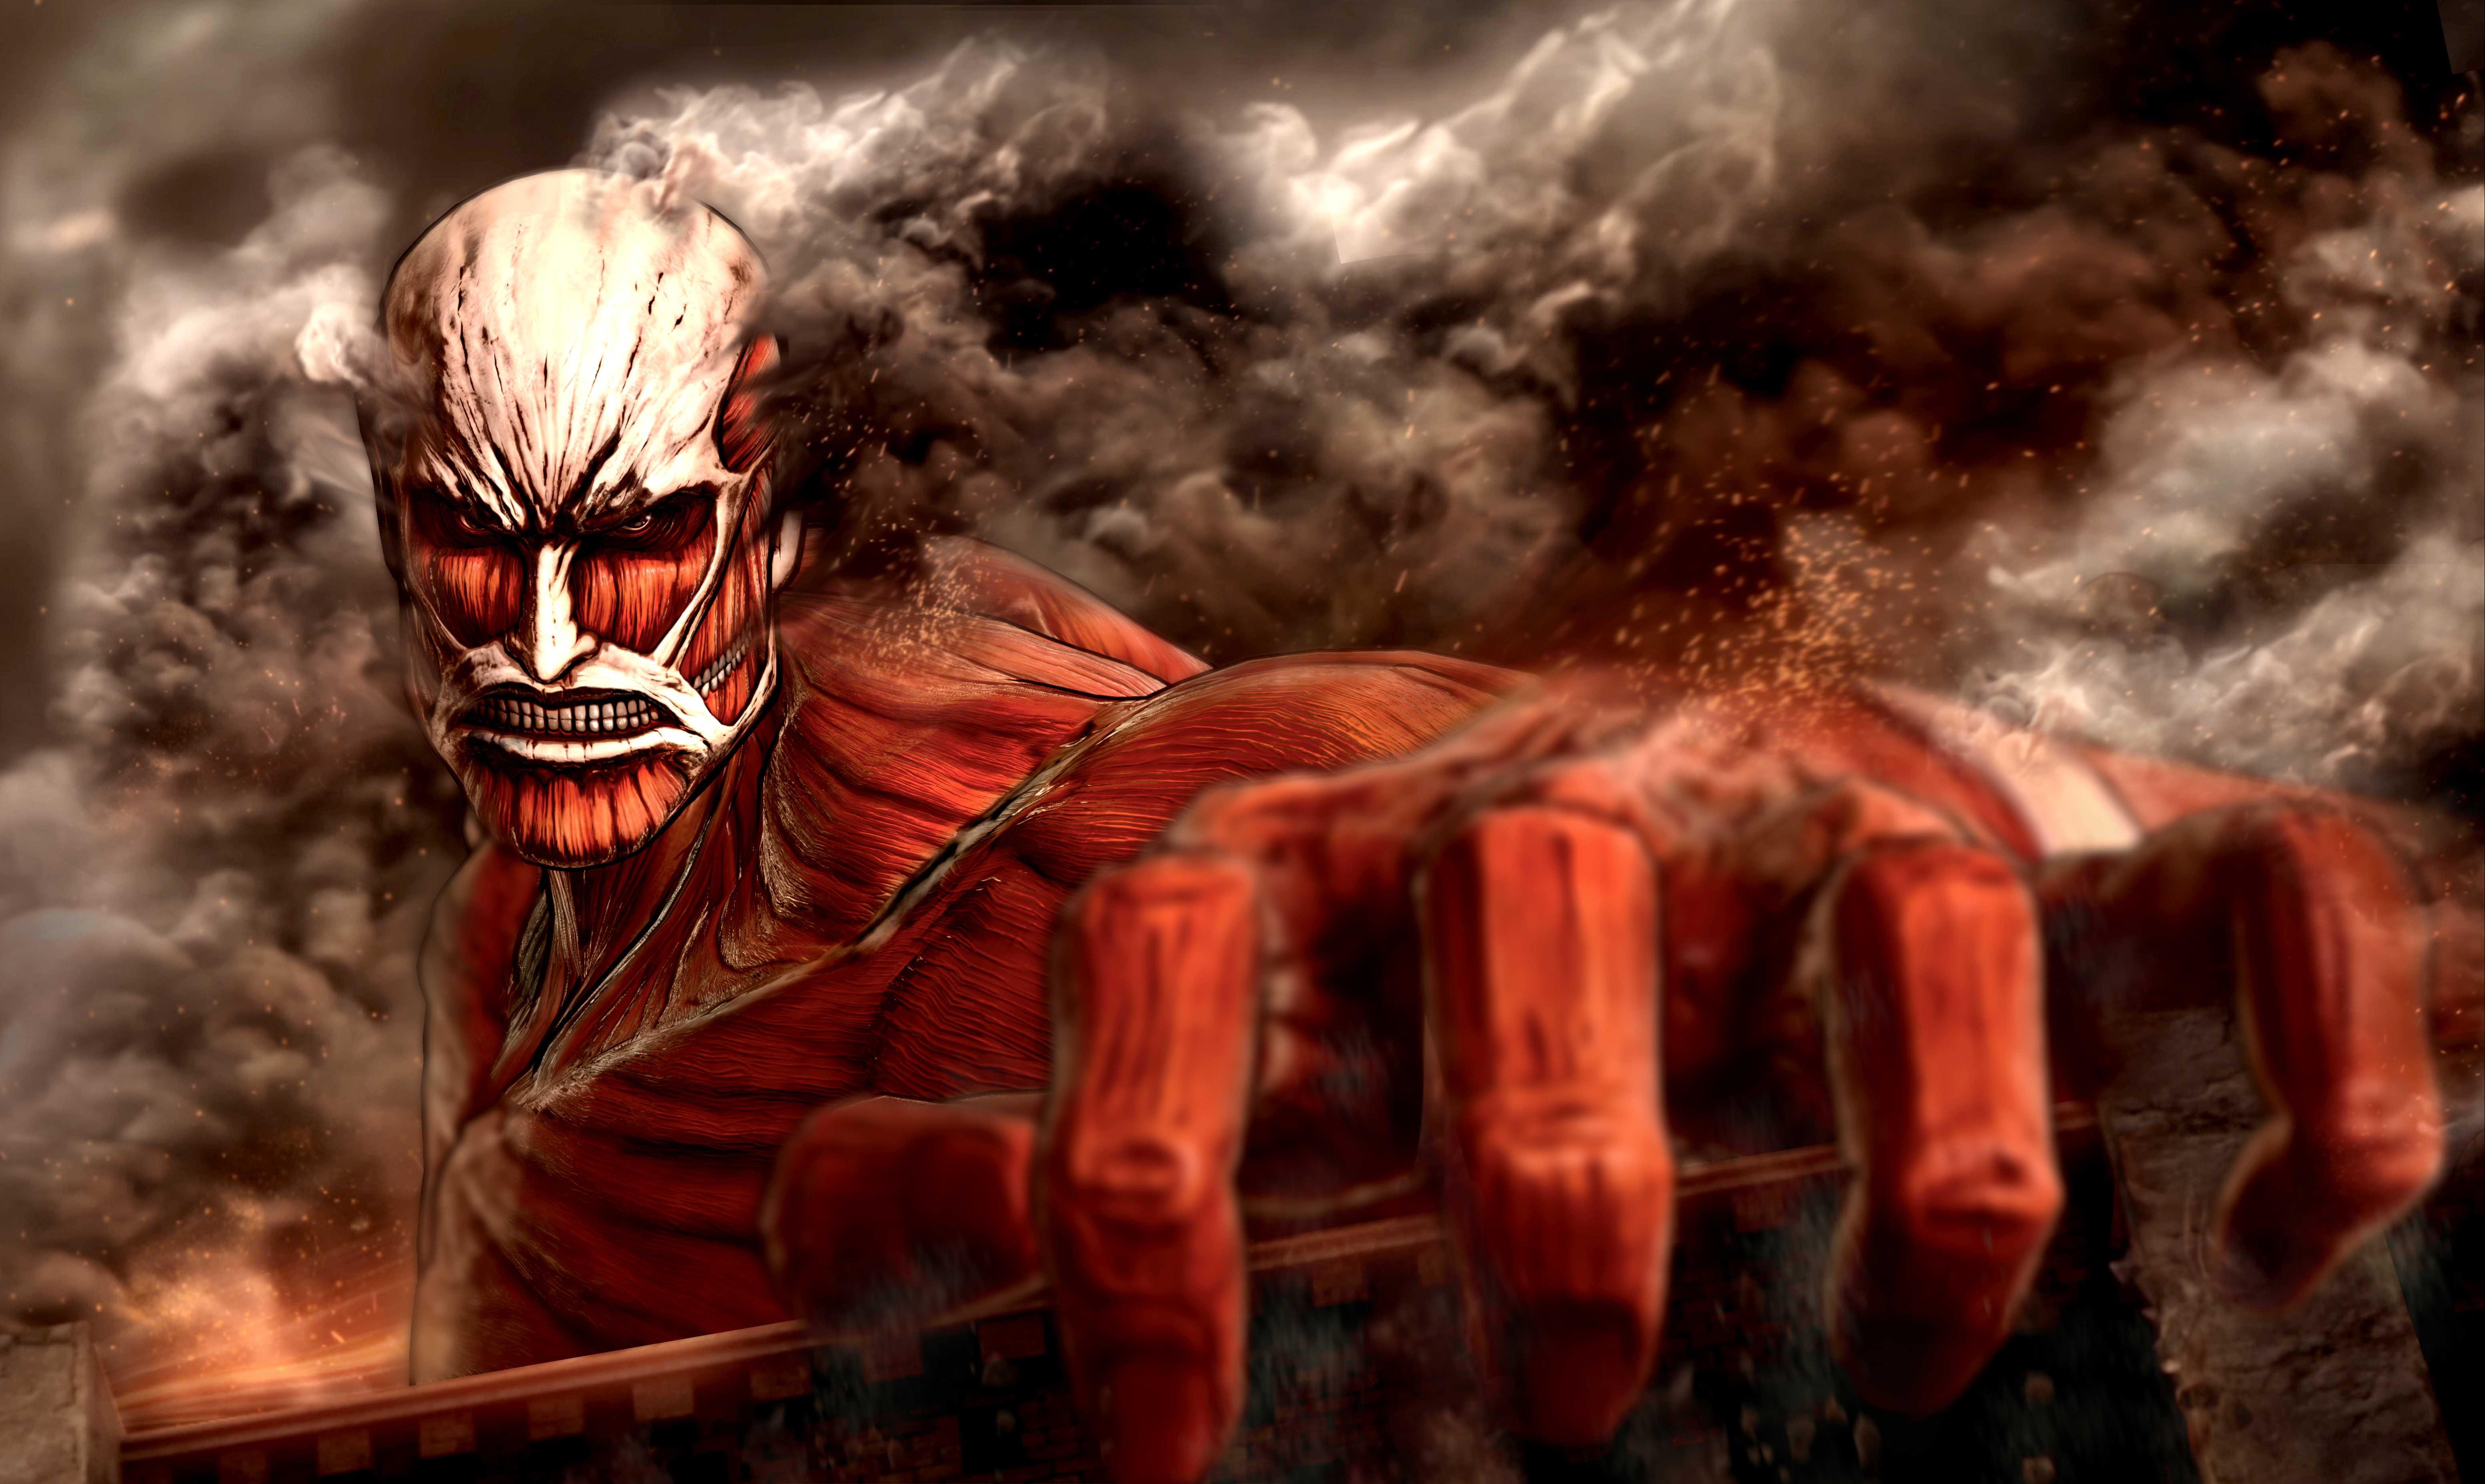 Attack On Titan 2560x1440 Download Hd Wallpaper Wallpapertip